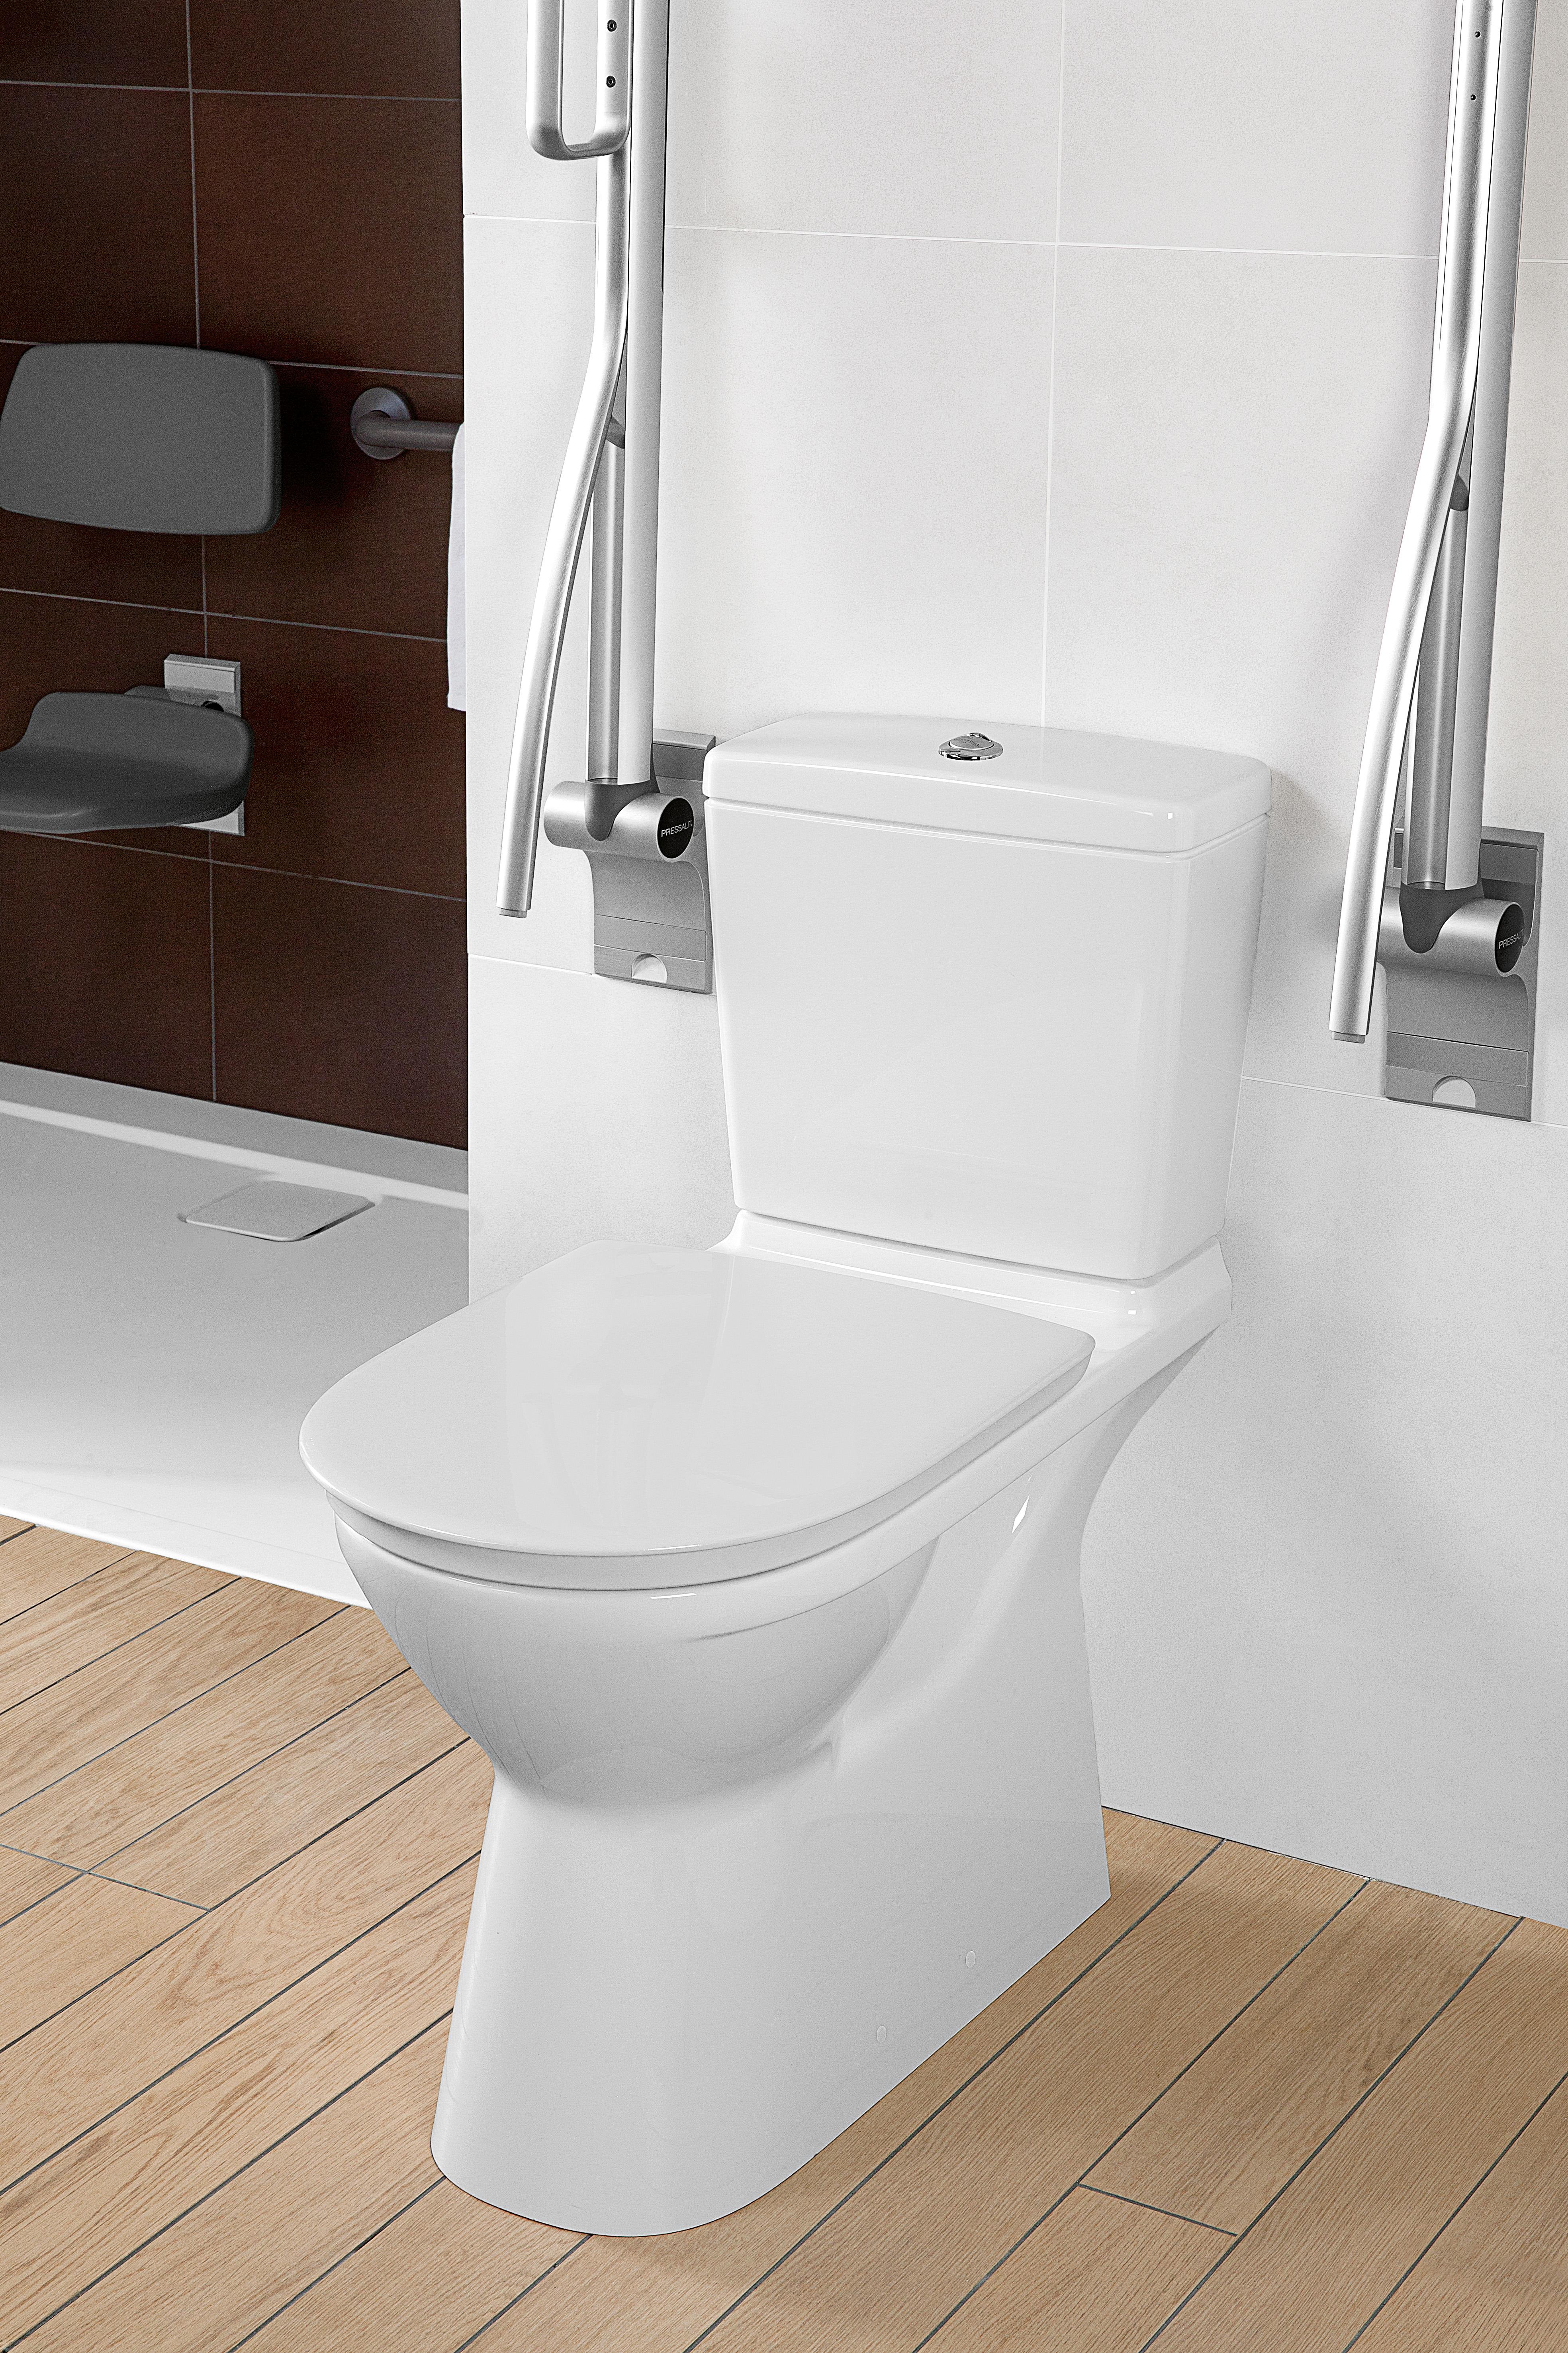 O.novo Vita Miski WC, Miski wc kompaktowe stojace, Miska ustępowa lejowa